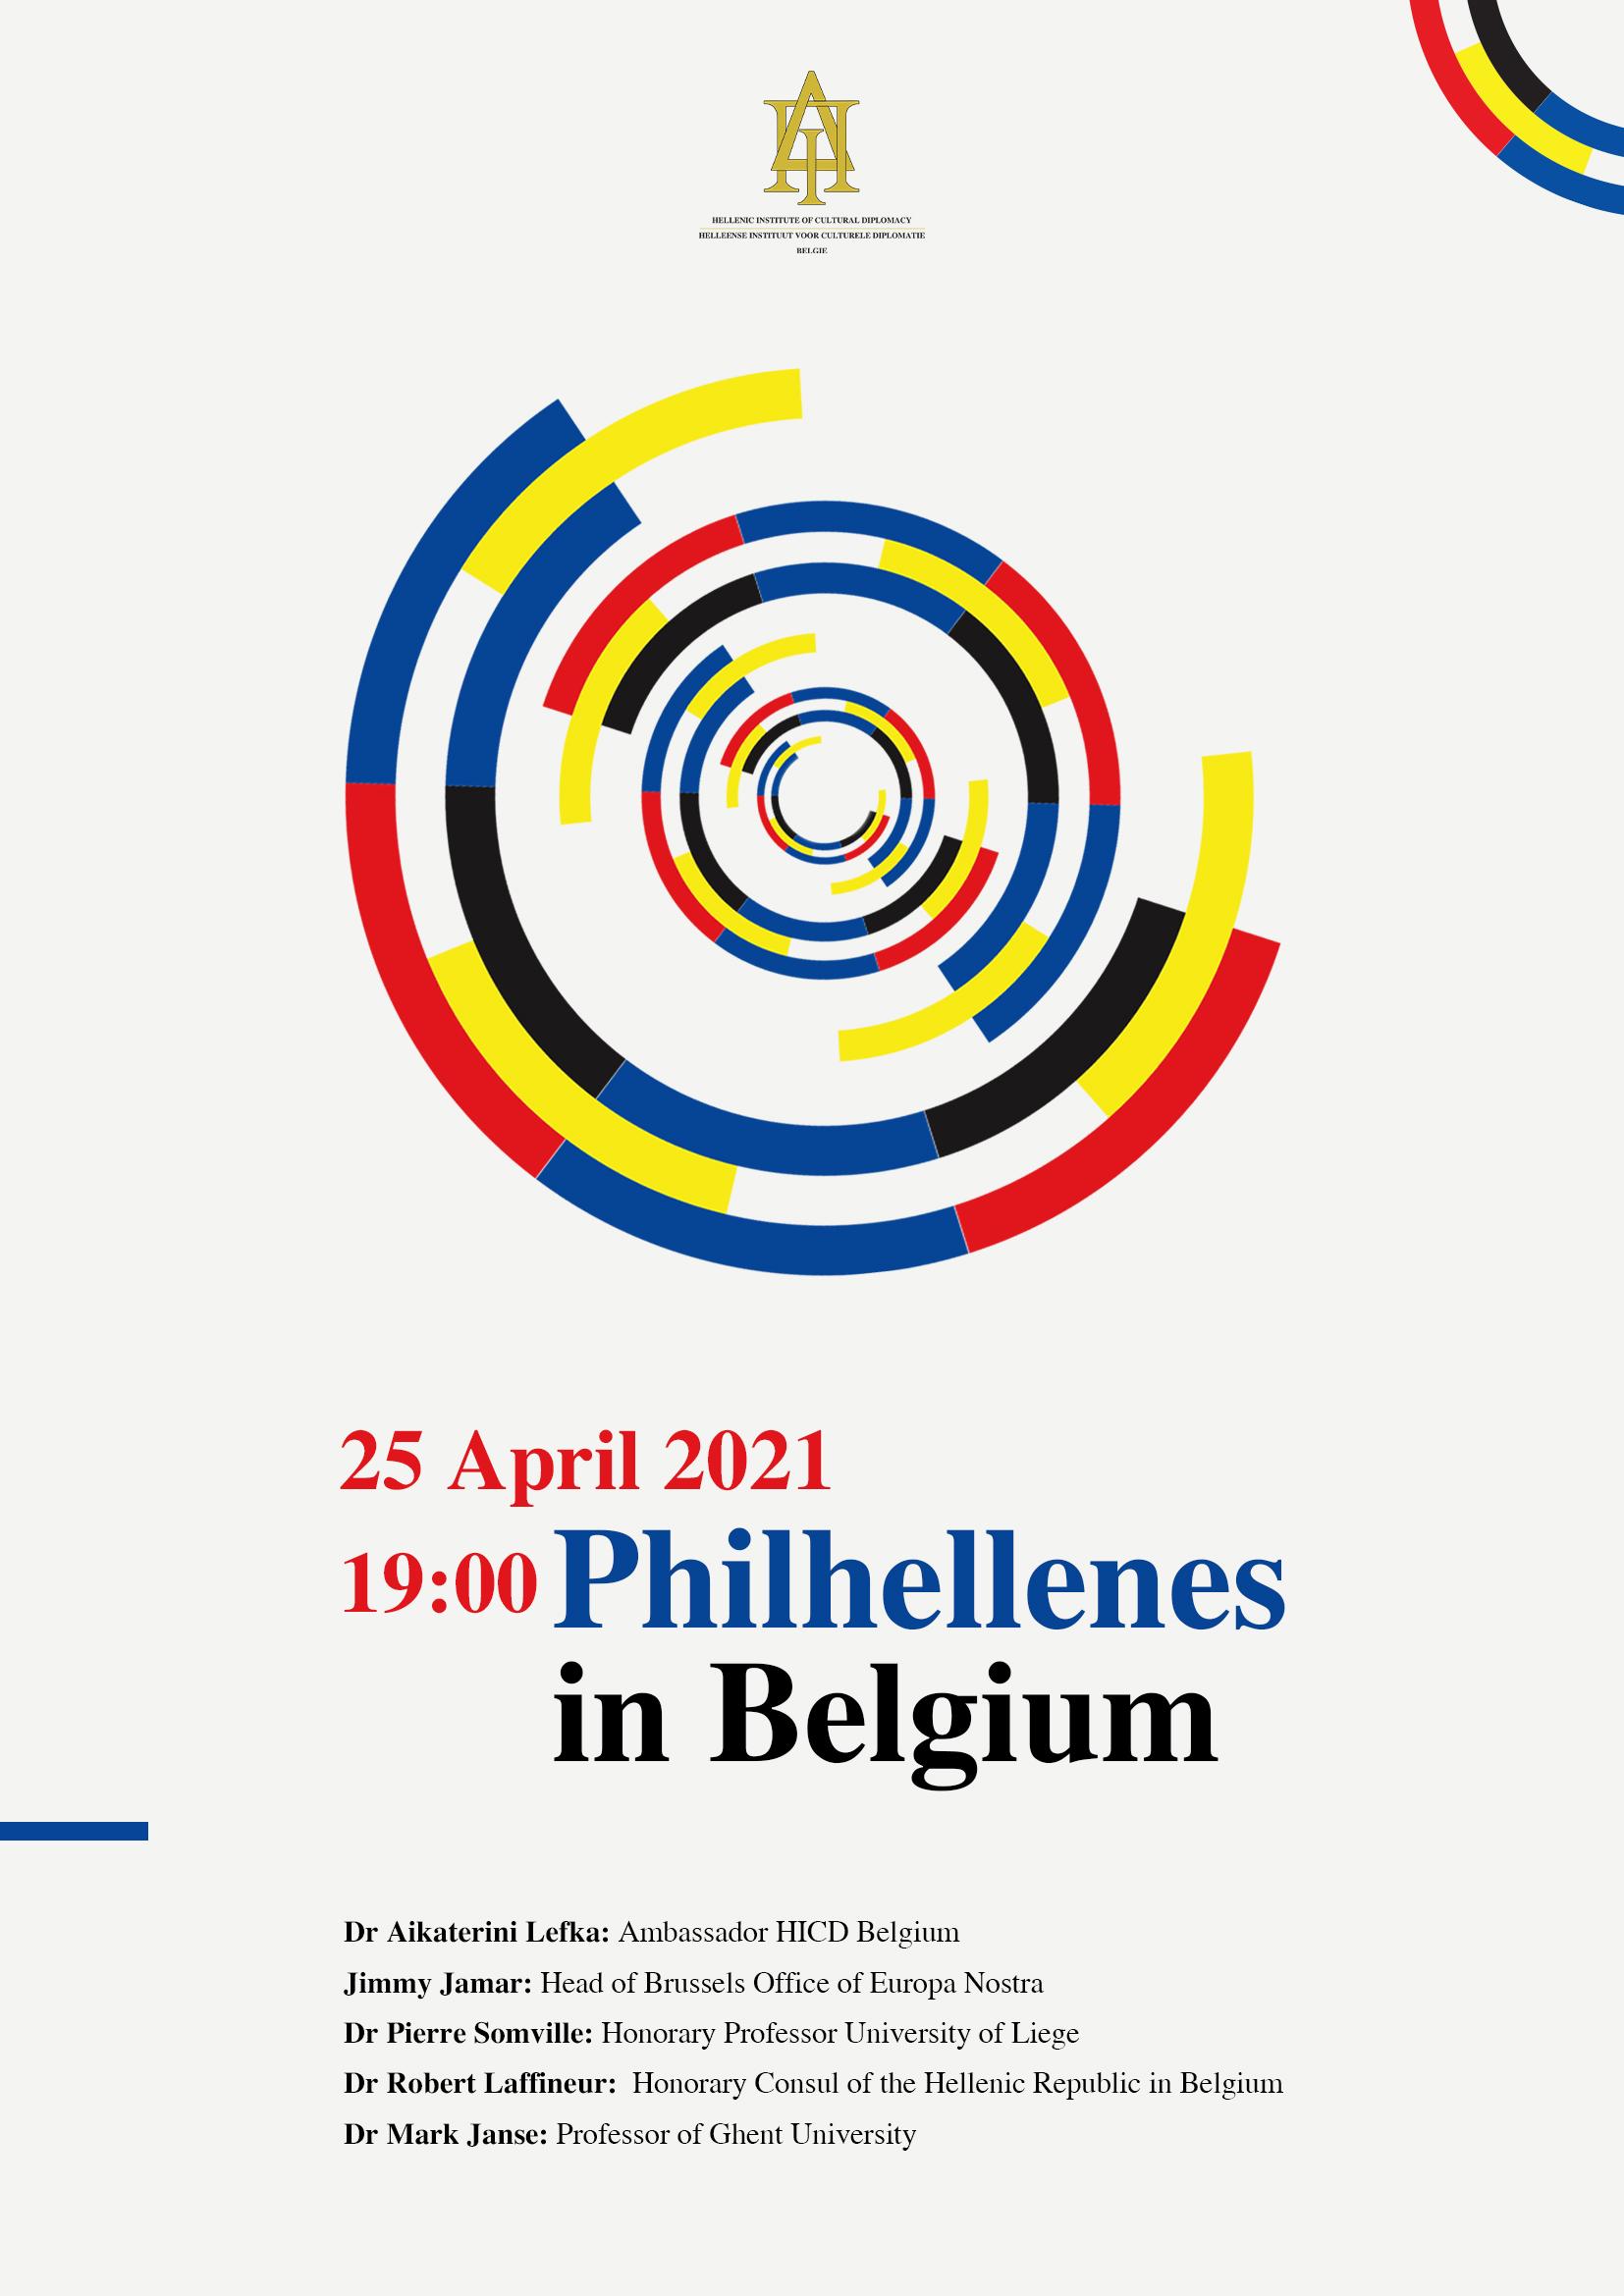 philhellenes_in_belgium Hellenic Institute of Cultural Diplomacy